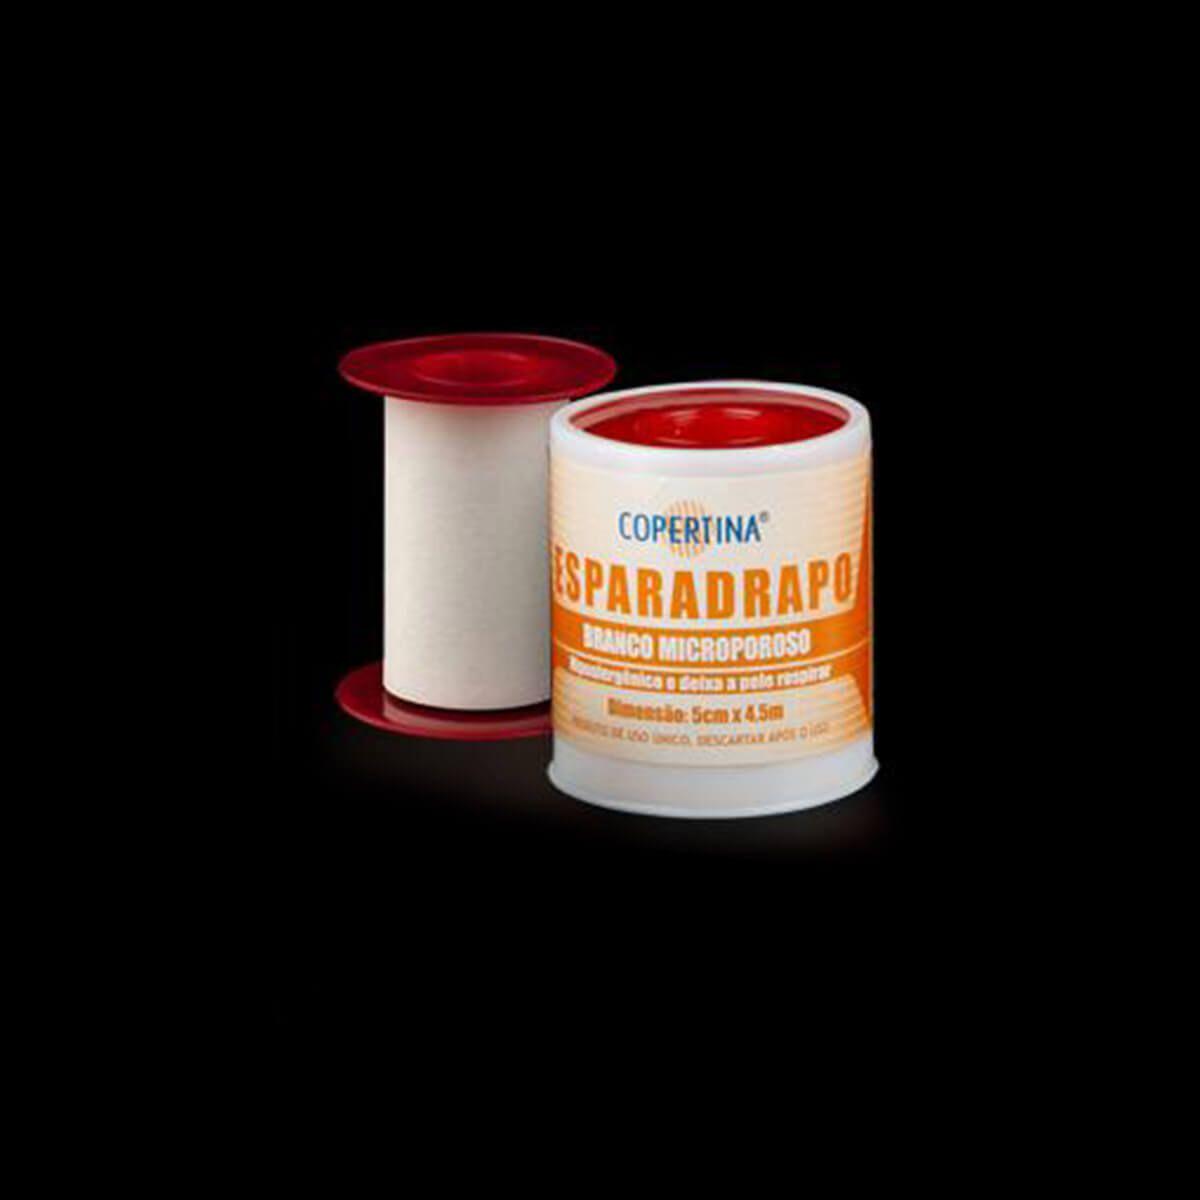 Esparadrapo Hipoalergênico E Microporoso Branco Unidade